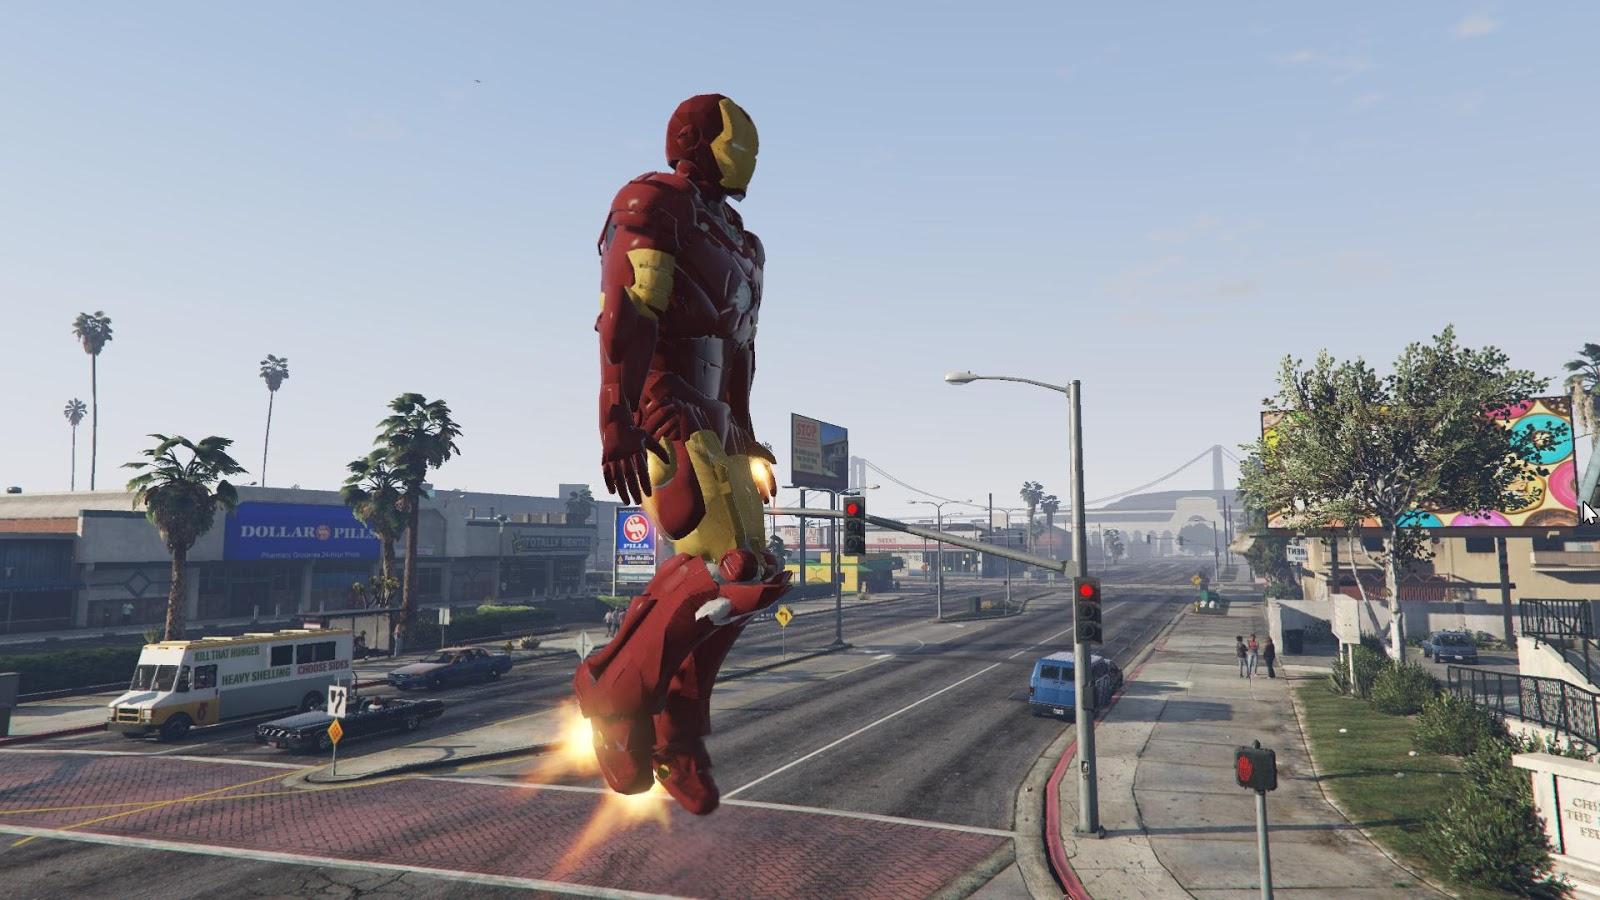 Meet the GTA 5 modder bringing The Avengers to Los Santos | PC Gamer